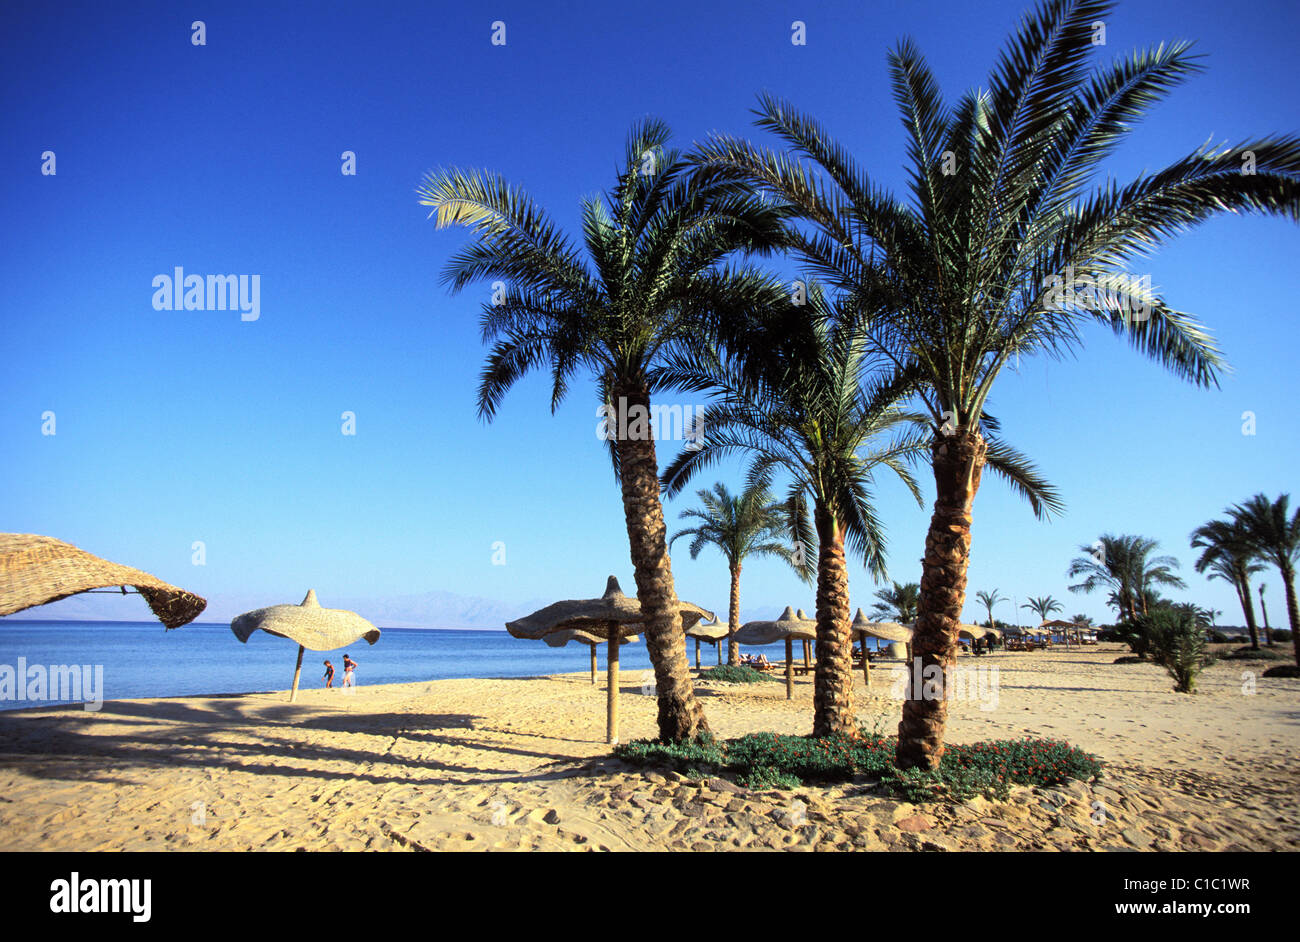 Egypt, Sinai Peninsula, the beach of Nuweiba, a little seaside resort in the Aqaba Gulf - Stock Image